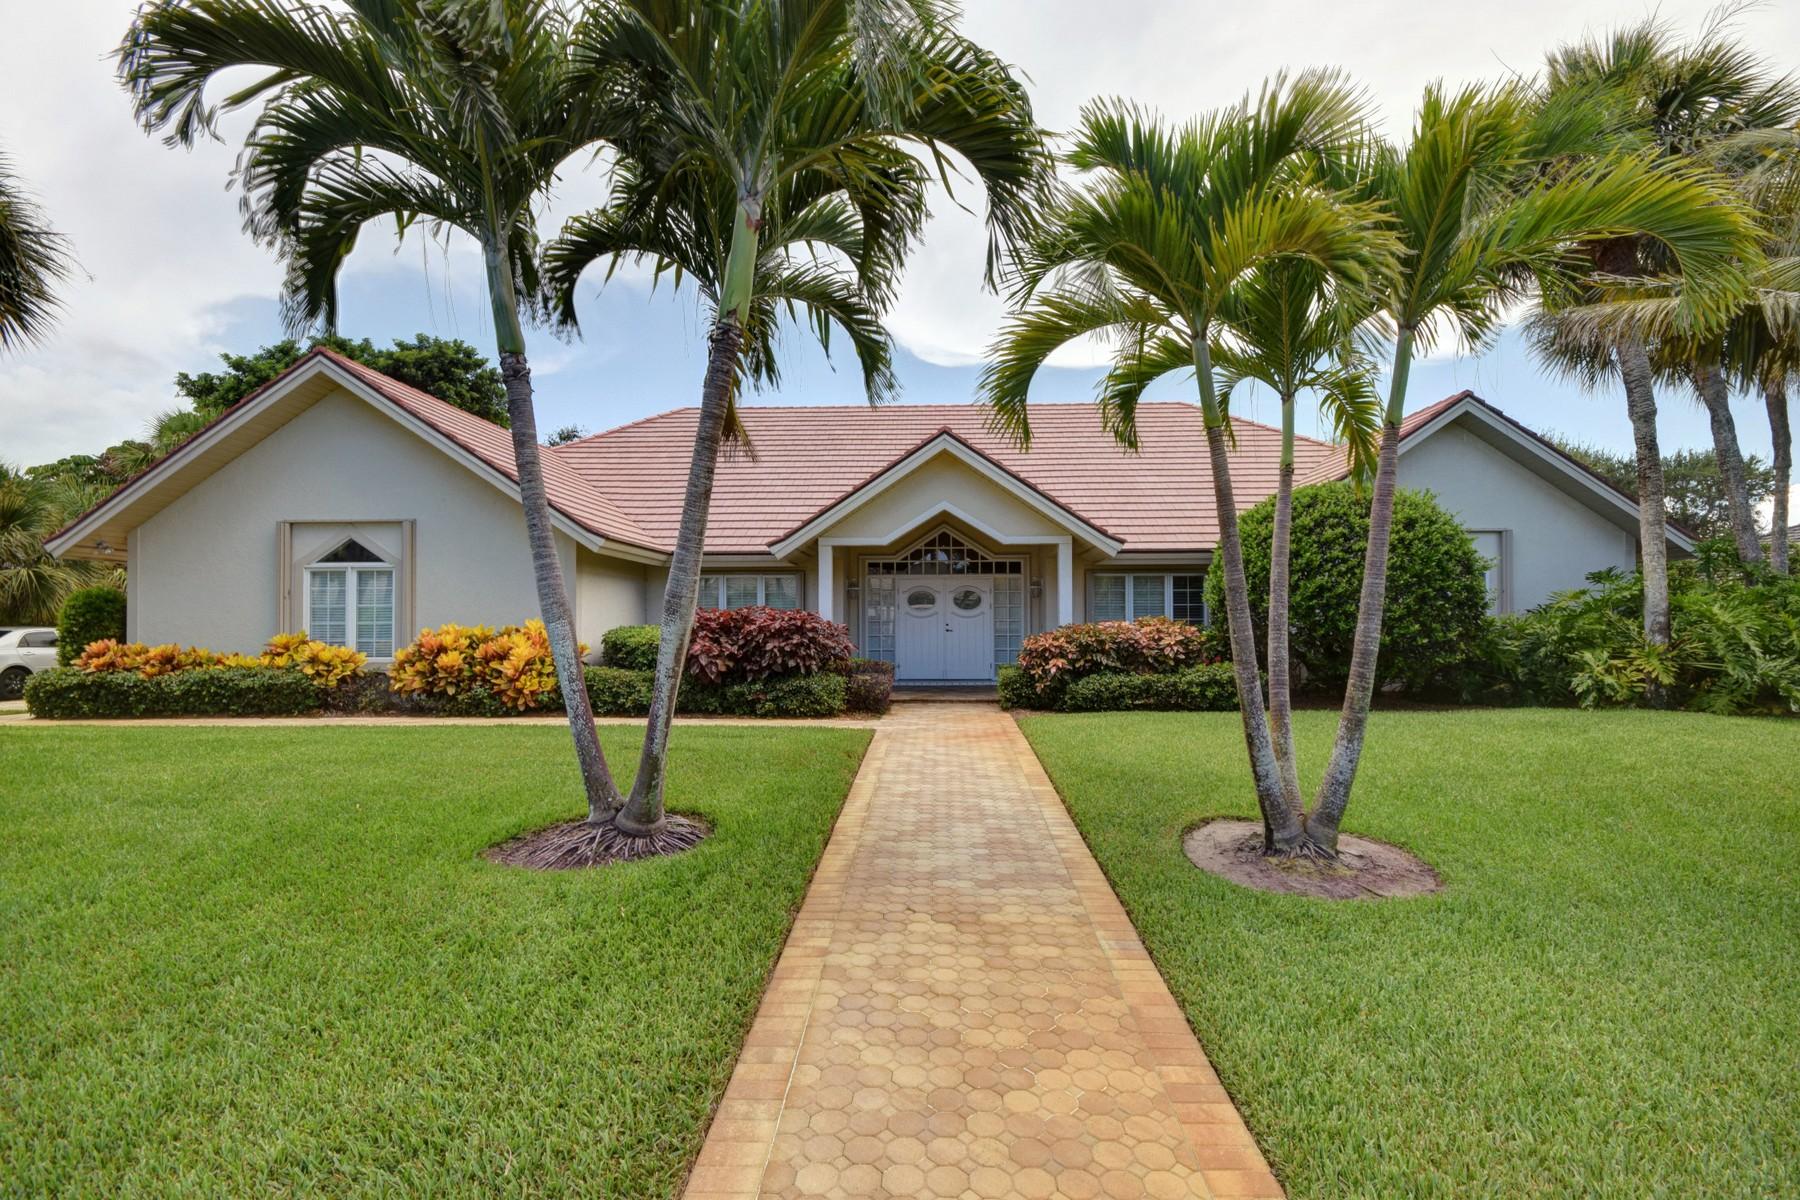 Casa Unifamiliar por un Venta en Custom home by the ocean 904 Holoma Drive Vero Beach, Florida 32963 Estados Unidos